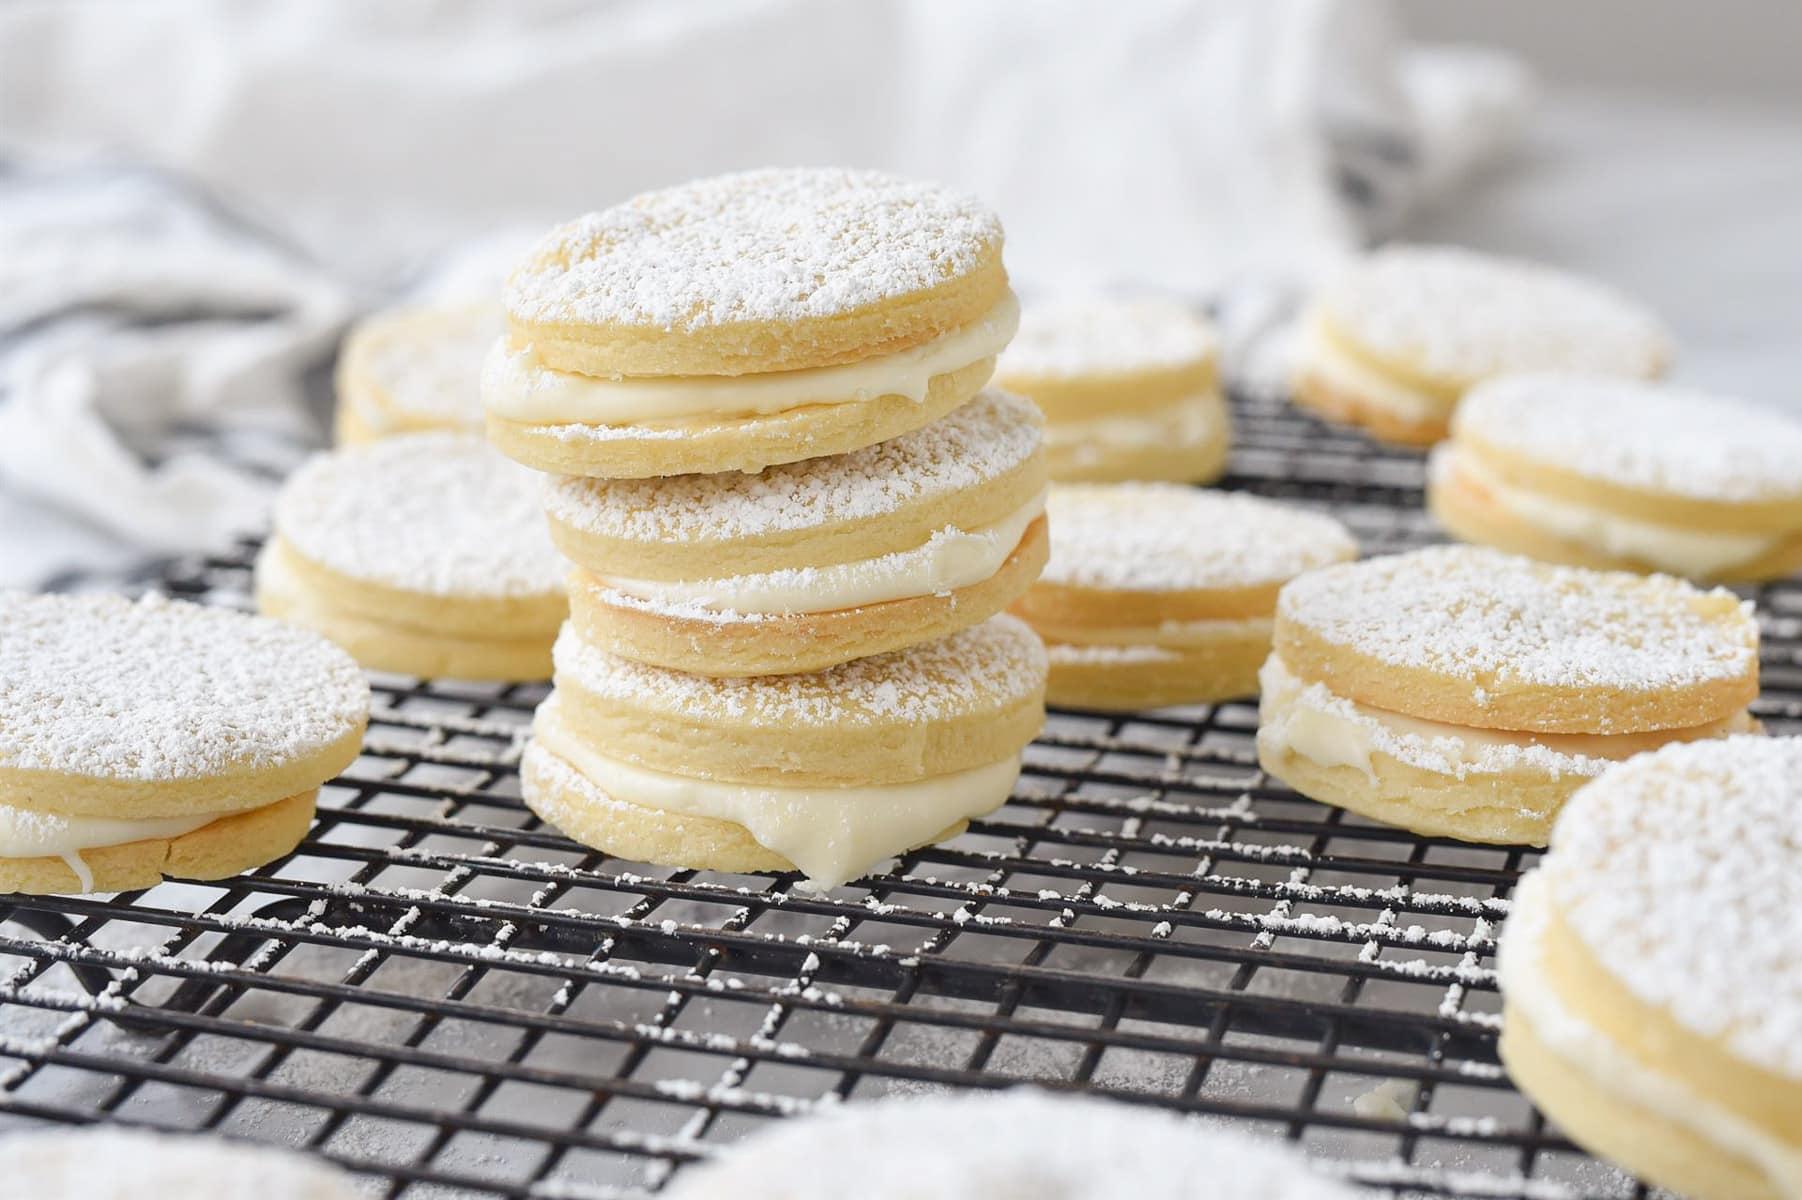 pile of lemon sandwich cookies on a cooling rack